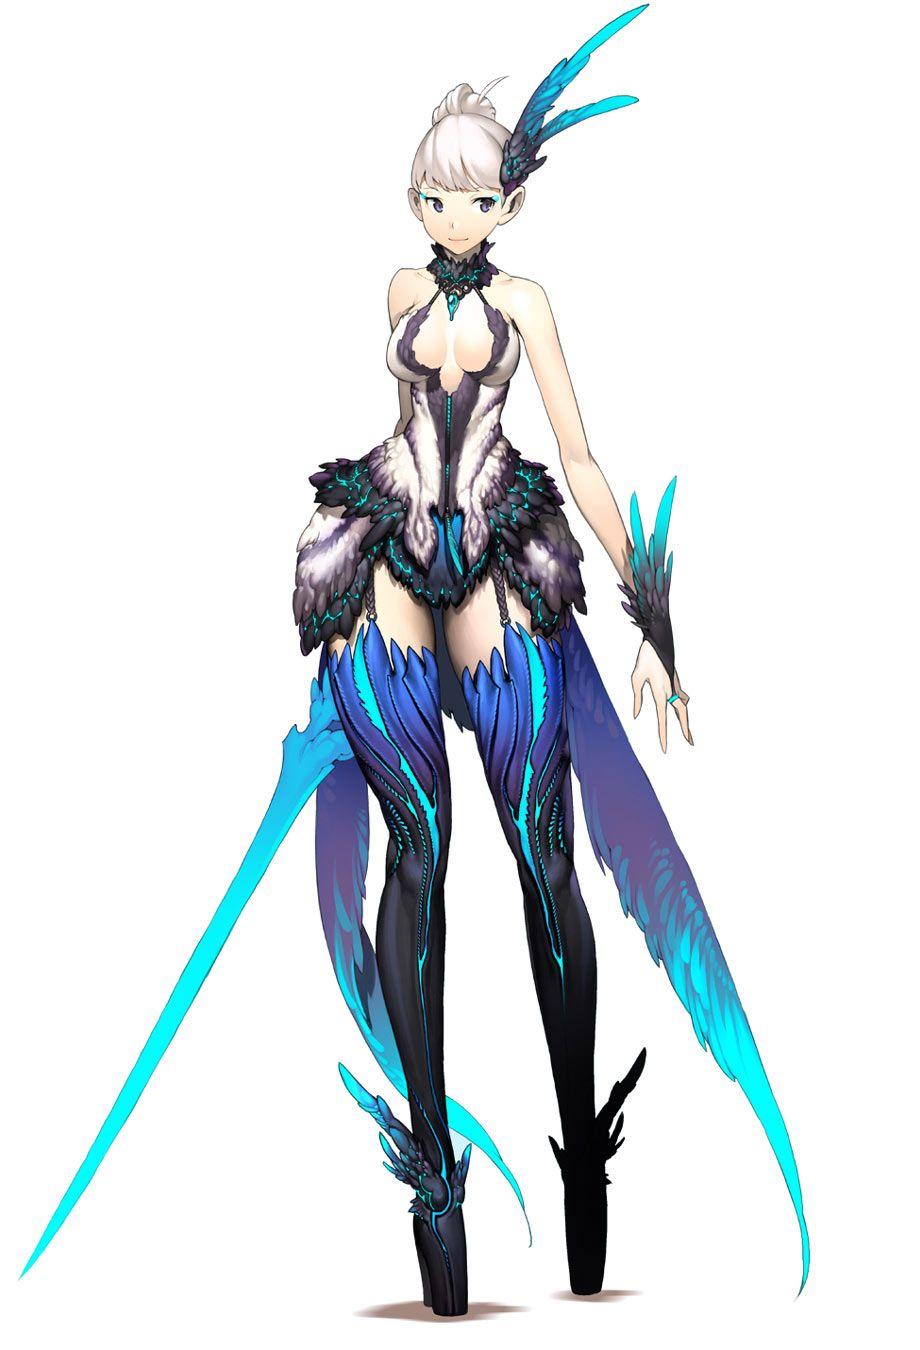 Game Anime Character Design Book : Blade soul female design video games pinterest